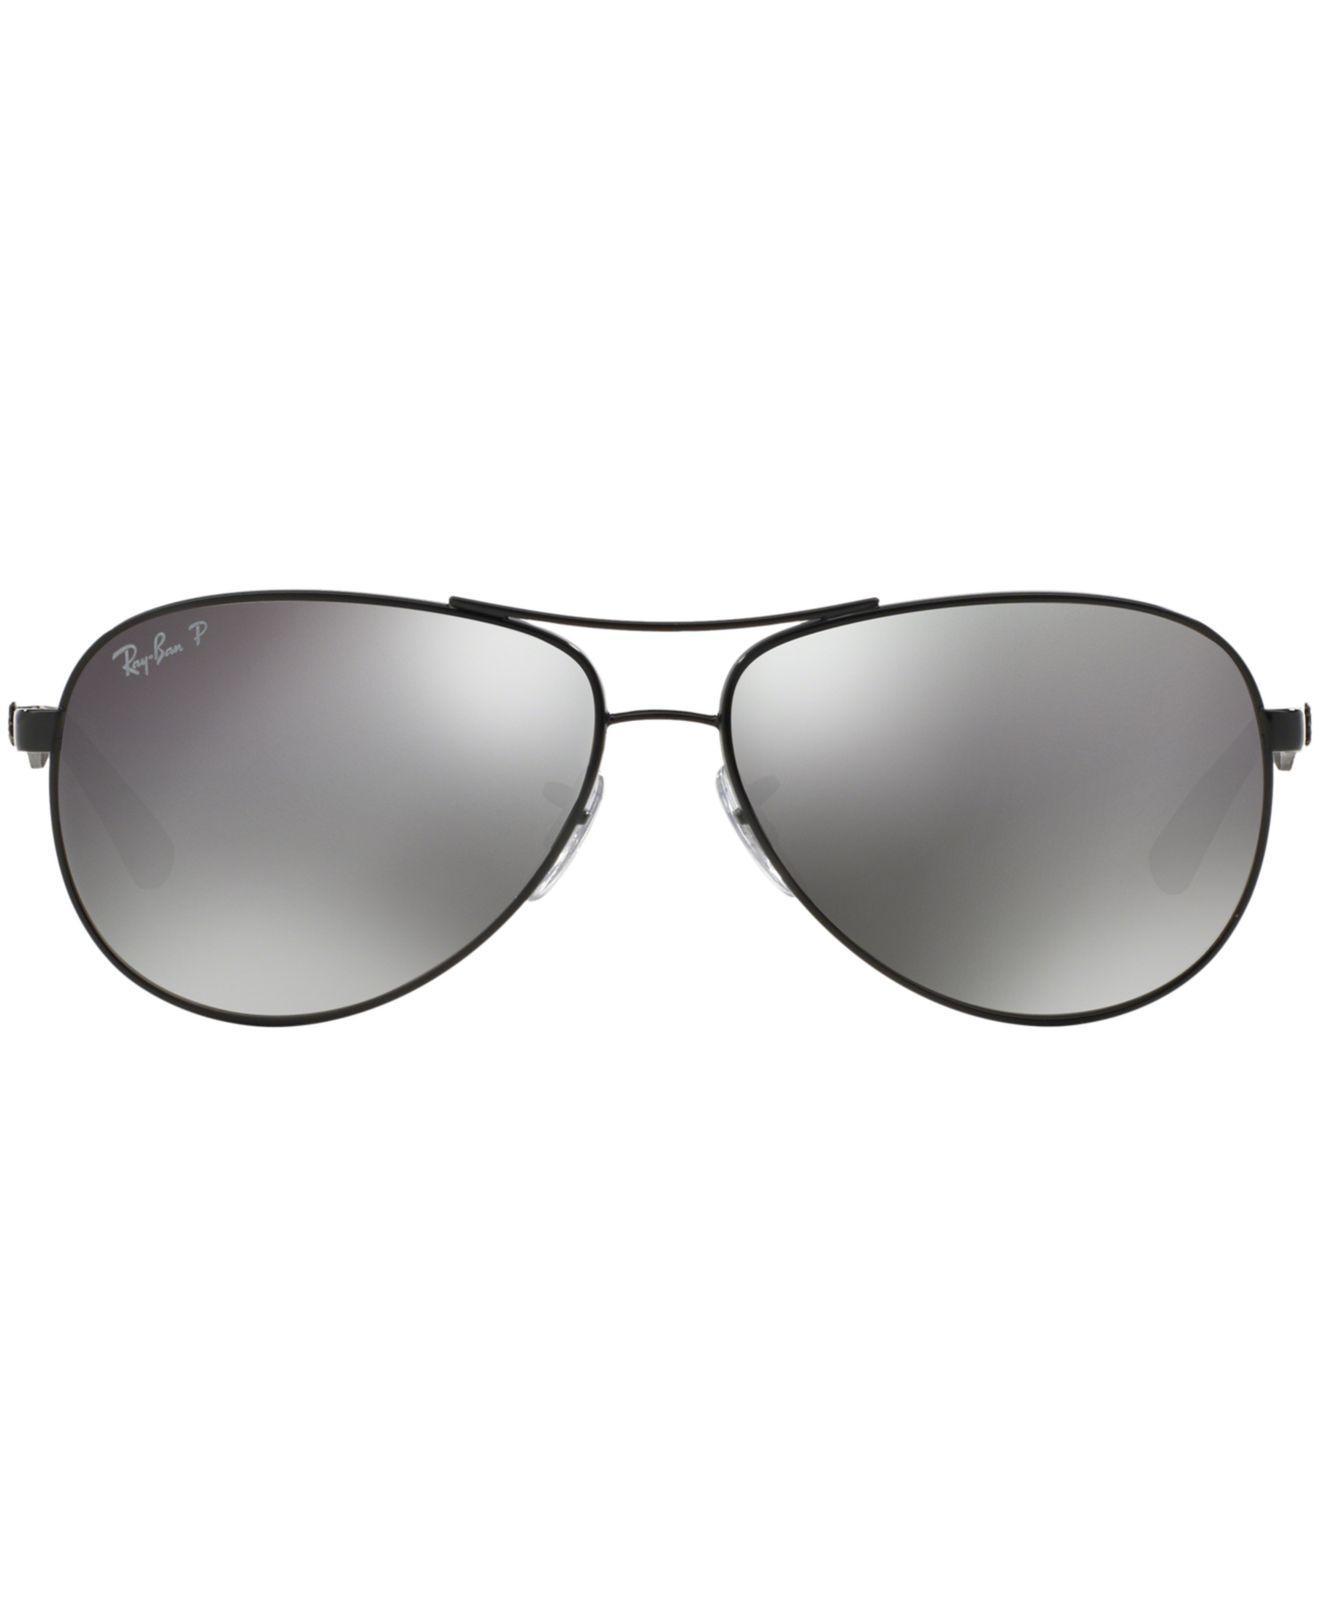 5bb3447d759 Lyst - Ray-Ban Sunglasses